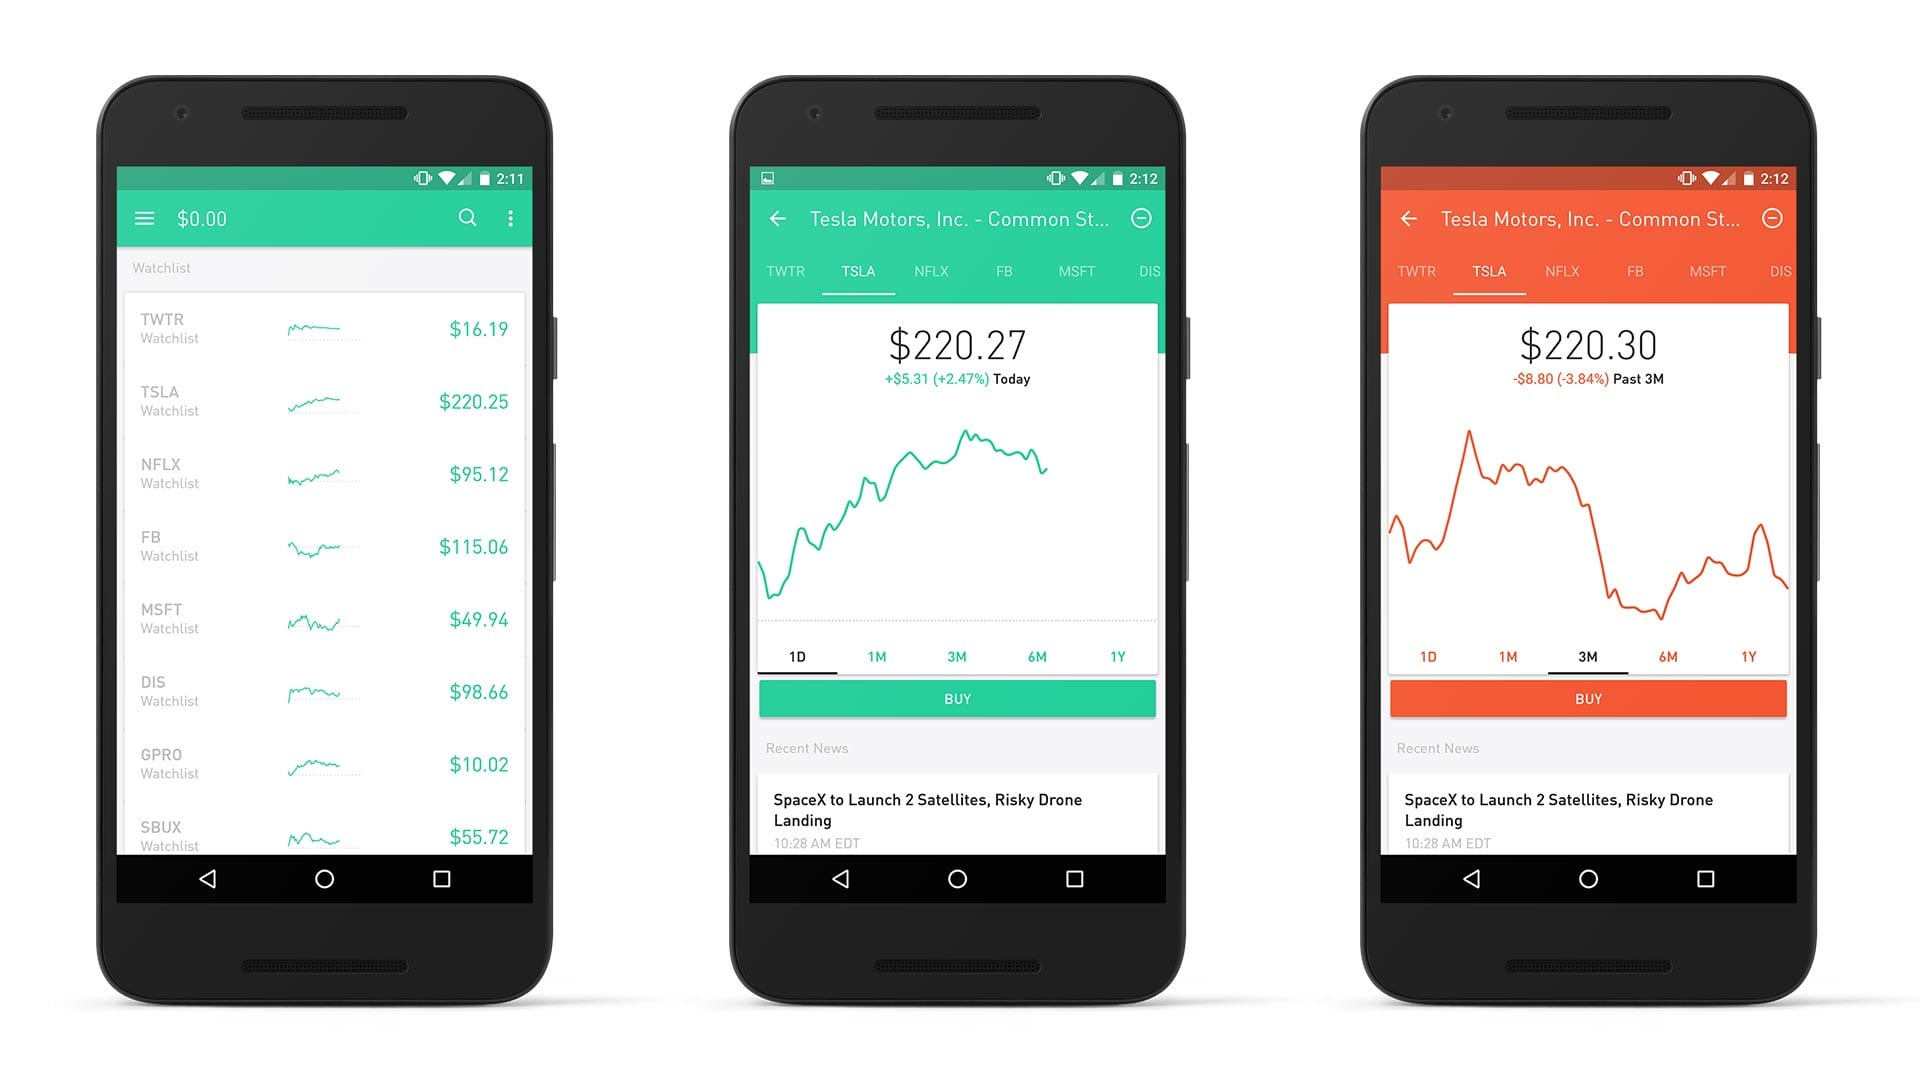 Robinhood App raises 363 million for Expanding its Cryptocurrency Trading Platform 2 - Robinhood App raises $363 million for Expanding its Cryptocurrency Trading Platform